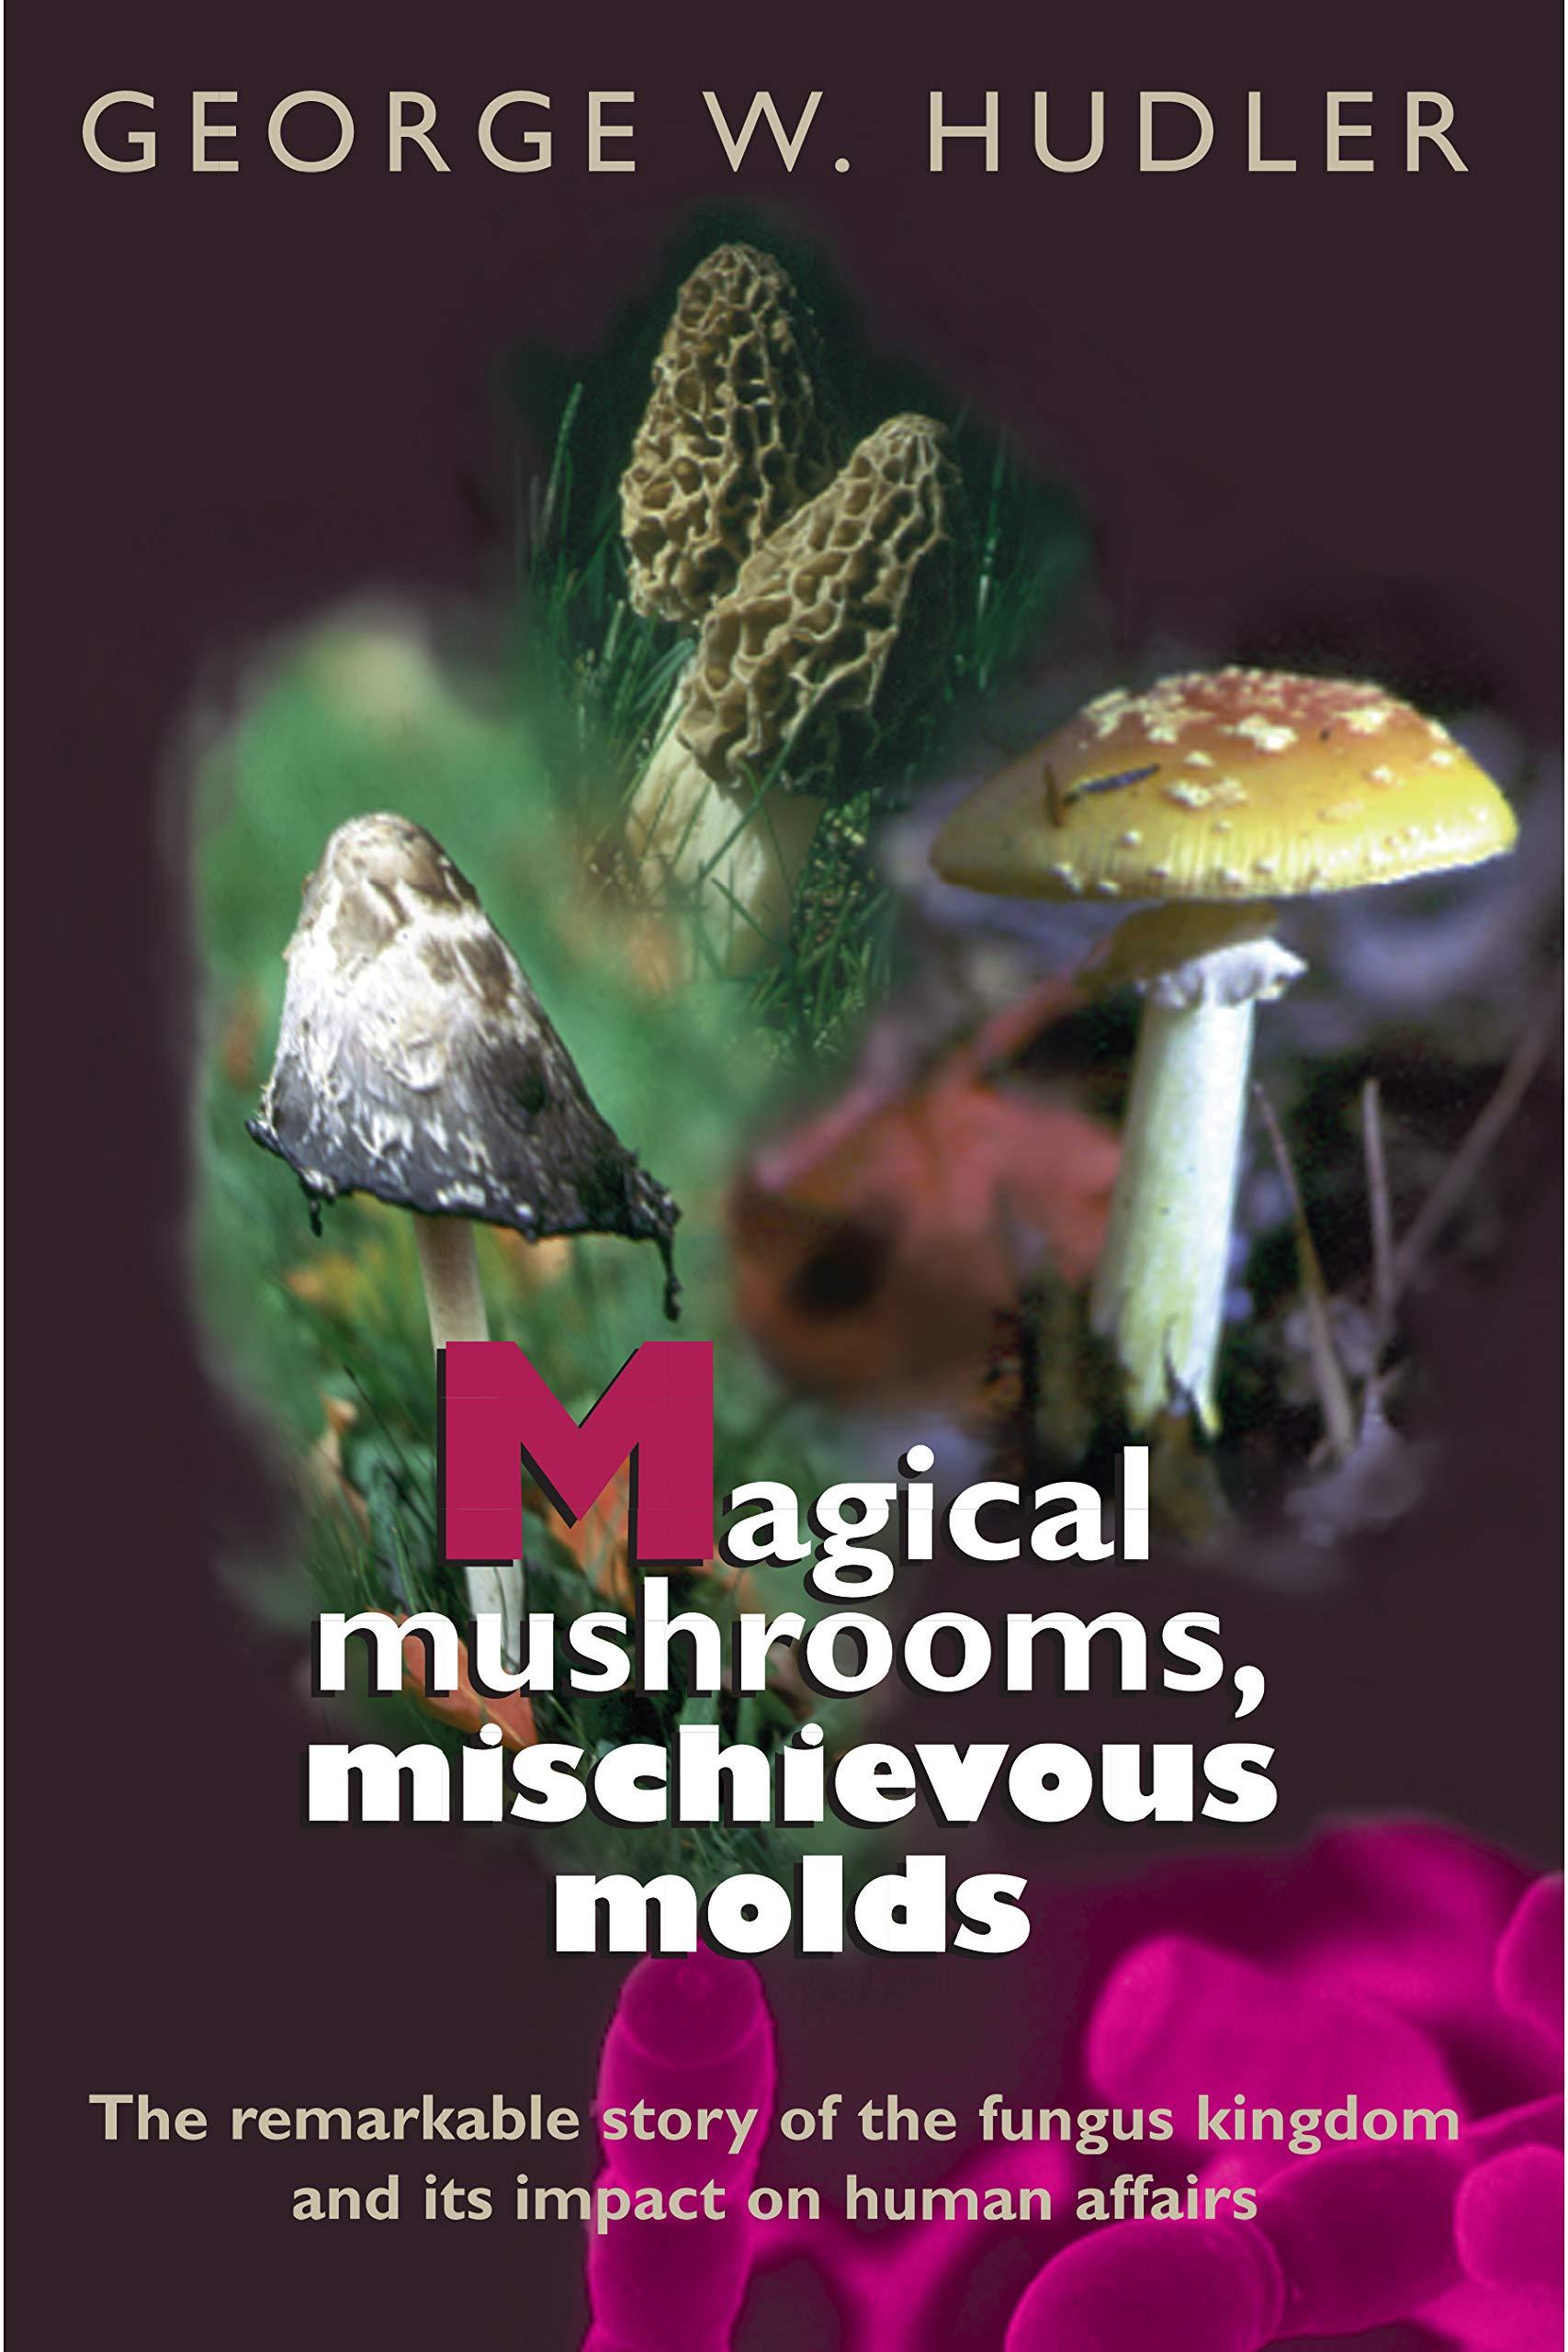 Magical Mushrooms, Mischievous Molds: George W. Hudler: 9780691070162:  Books - Amazon.ca